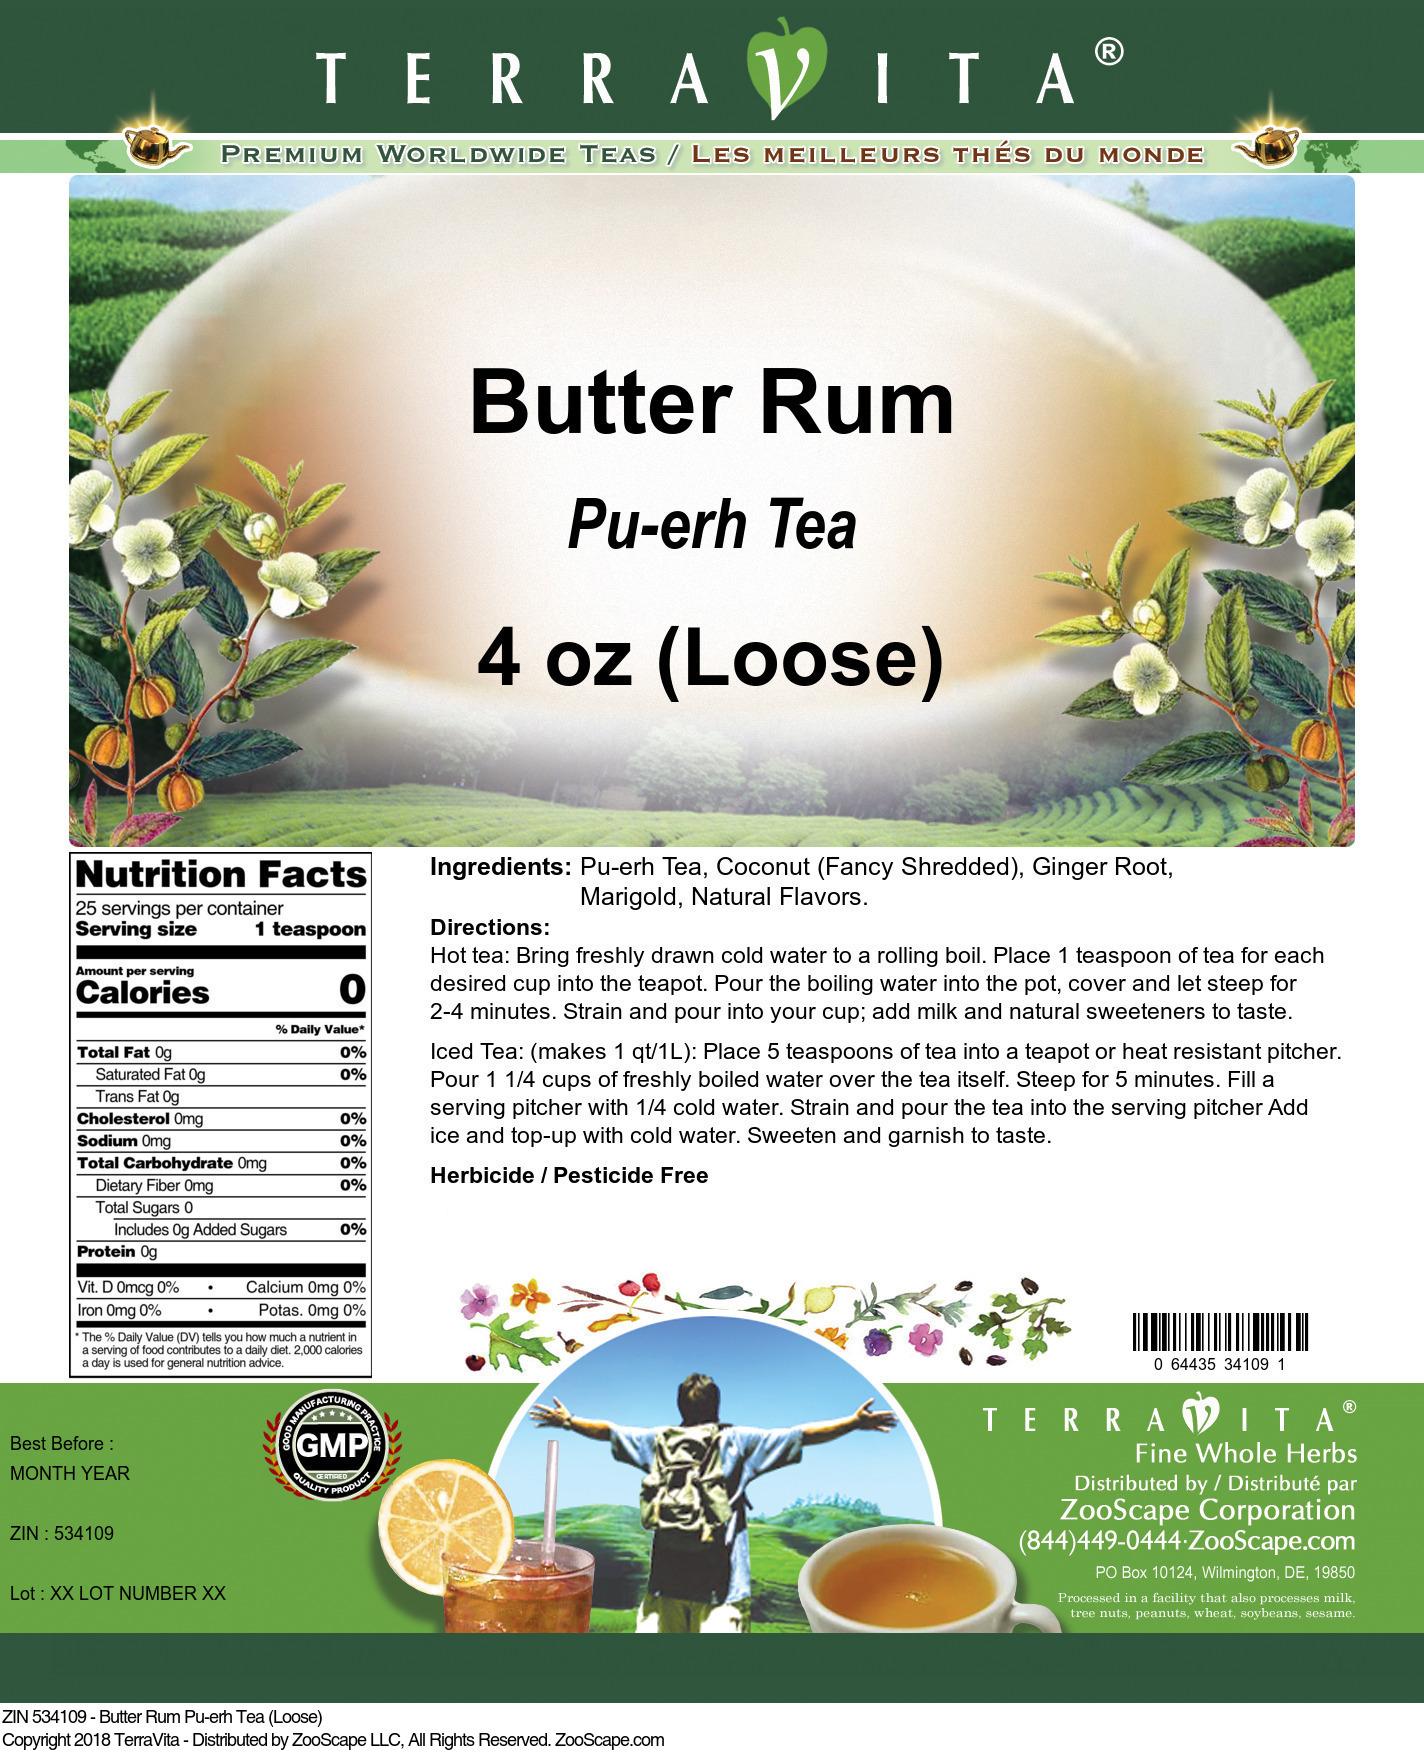 Butter Rum Pu-erh Tea (Loose)